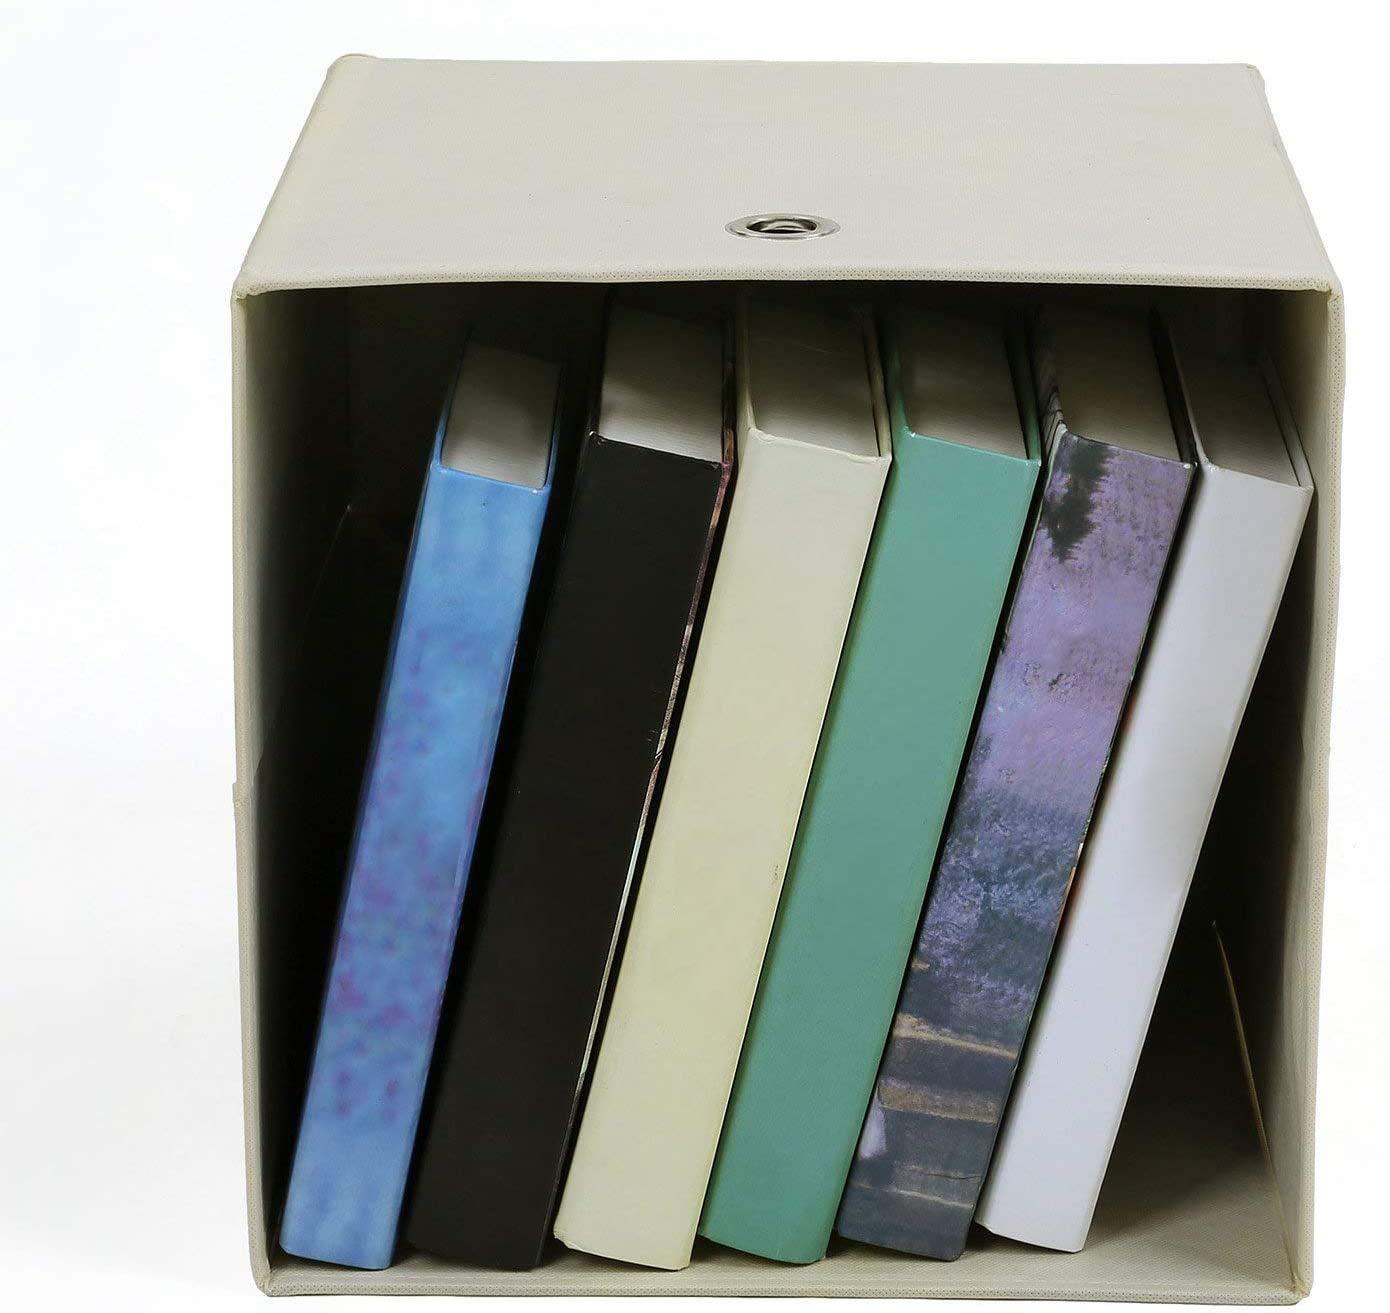 SONGMICS Juego de 6 Cajas de Almacenaje, Cubos de Tela Plegables, 30 x 30 x 30 cm, Beige RFB02M-3: Amazon.es: Hogar